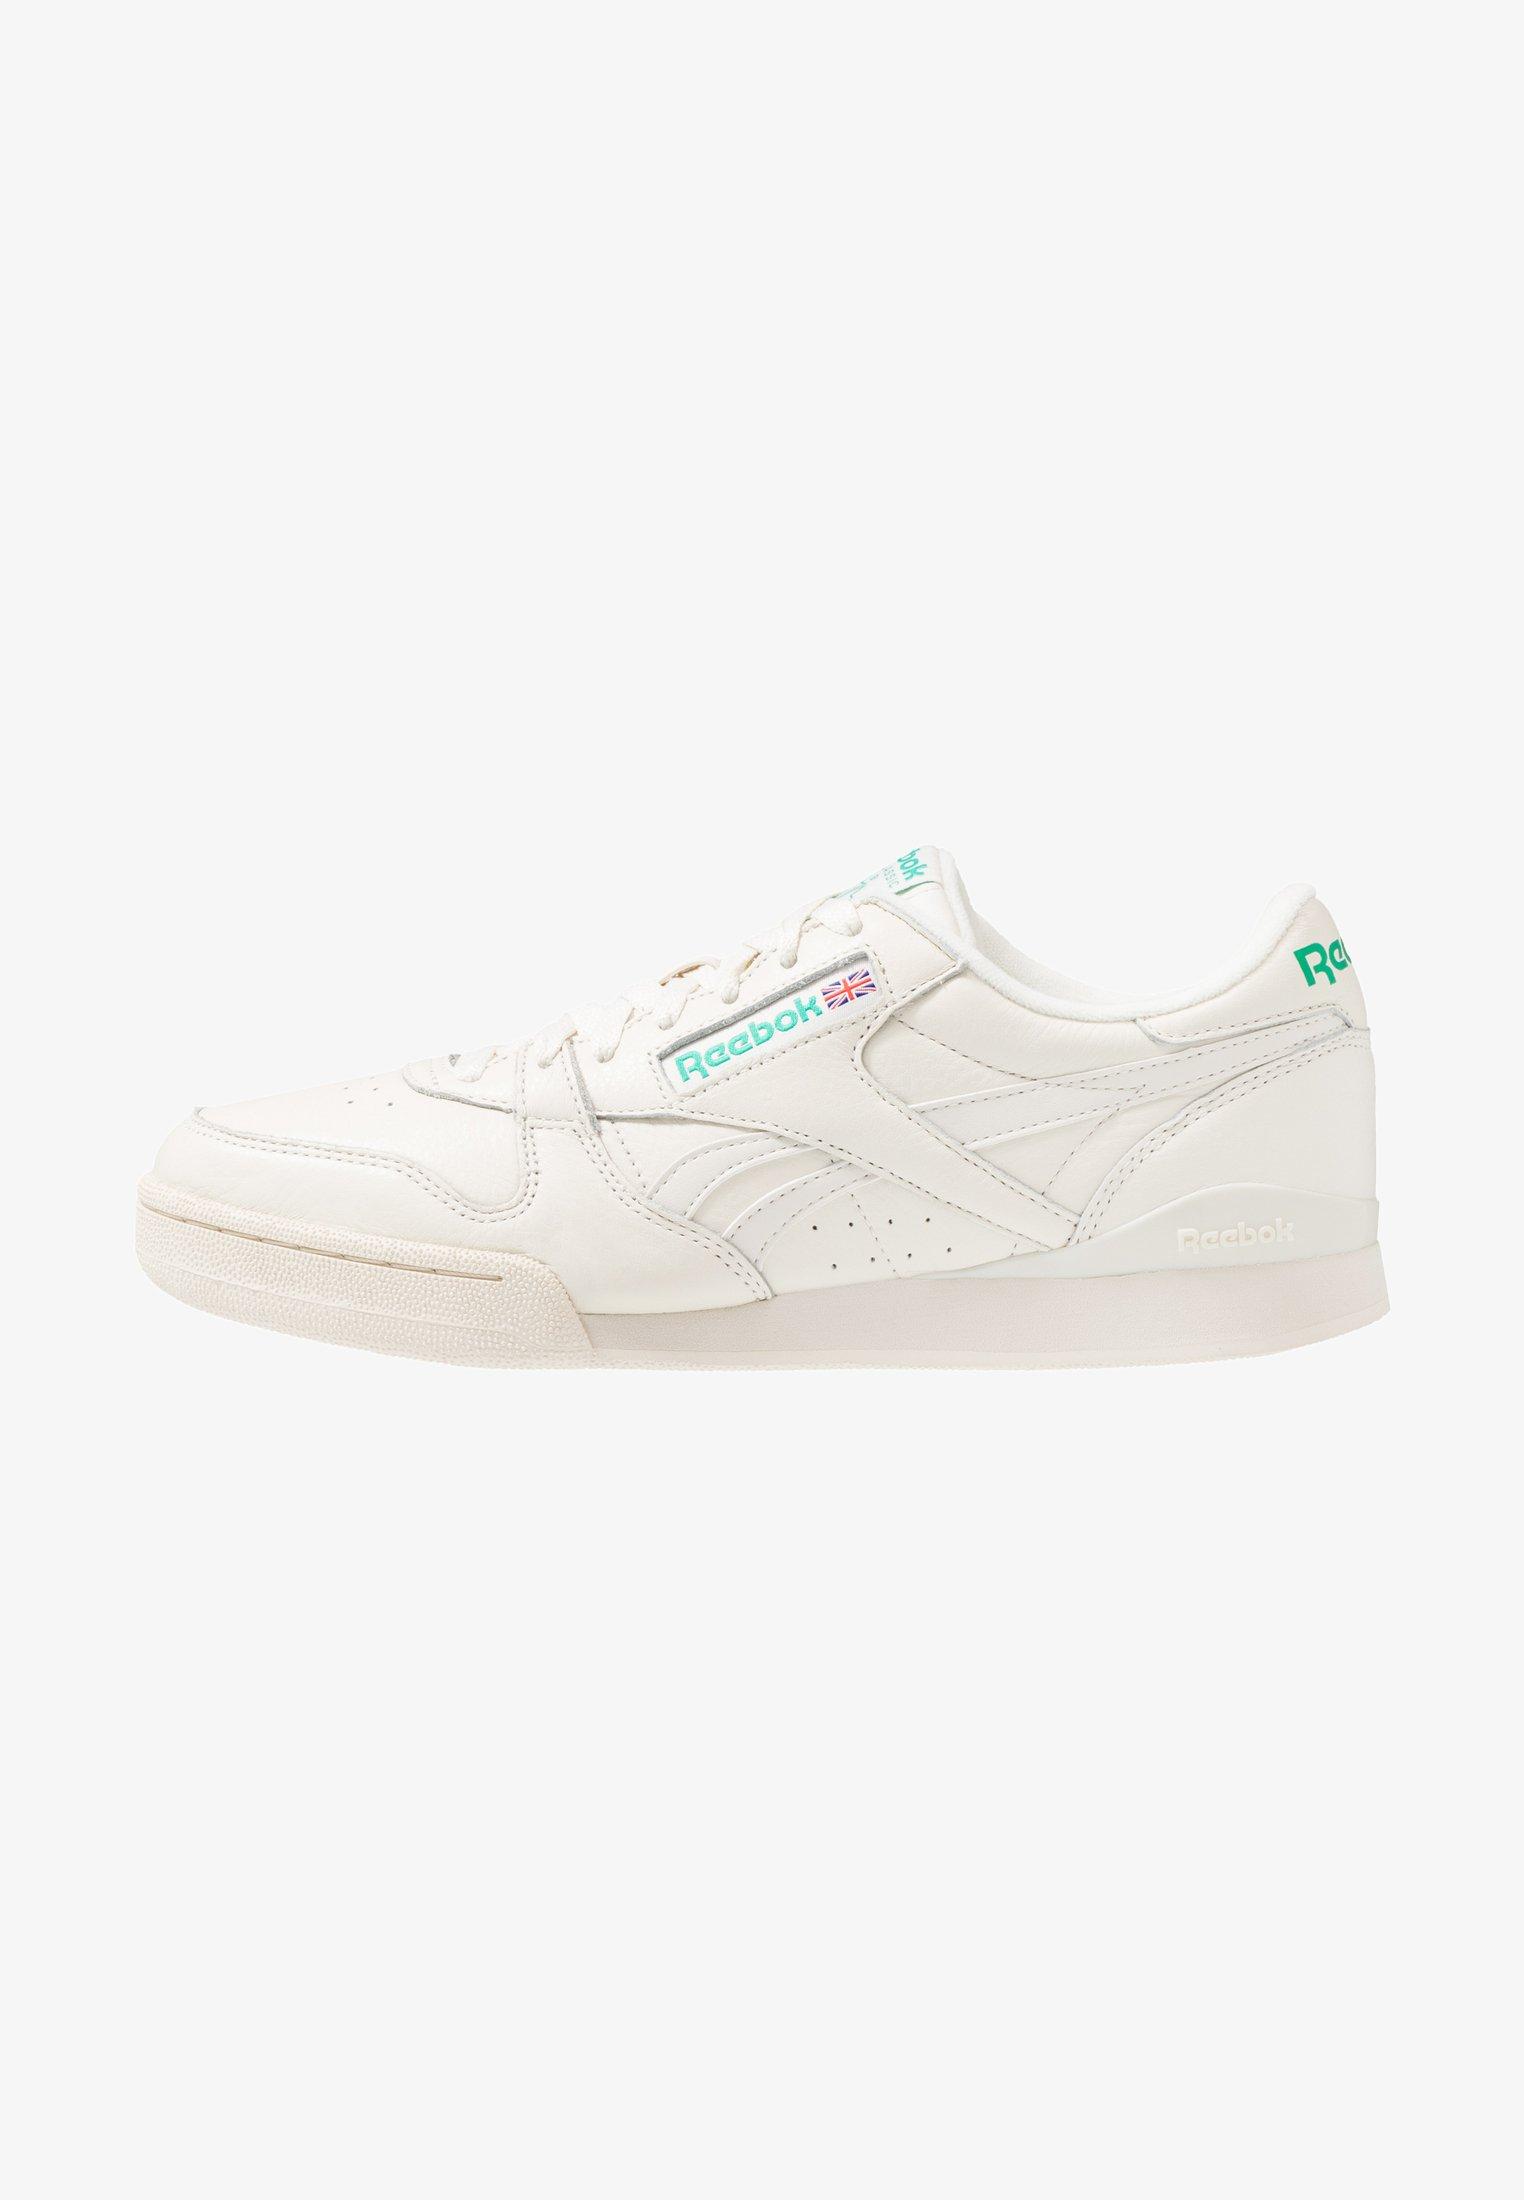 Reebok Classic Phase 1 Pro Soft Suede Retro Shoes Sneaker Low Chalk Paperwhite Emerald Offwhite Zalando De